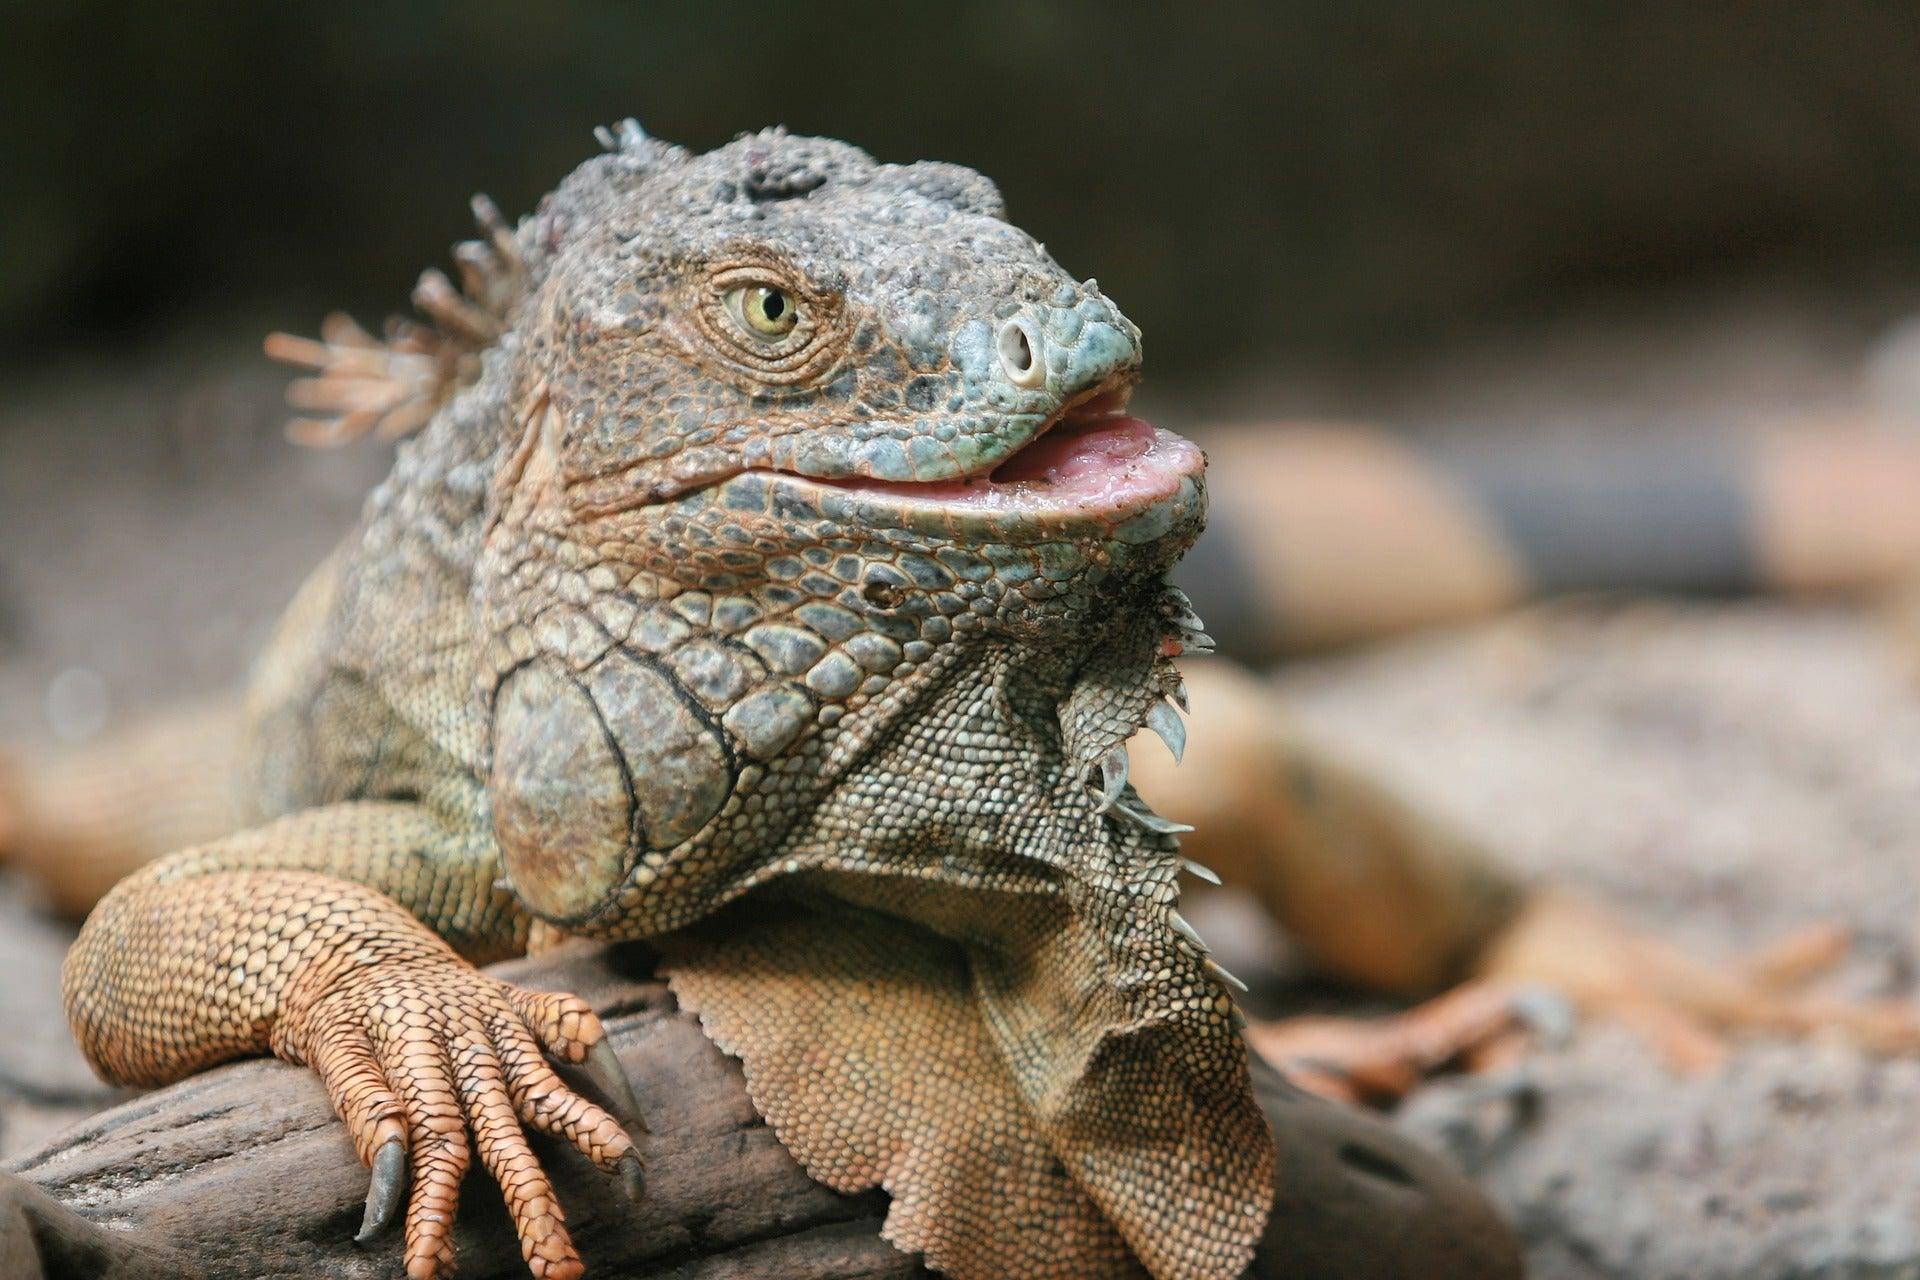 A large iguana on rocks.